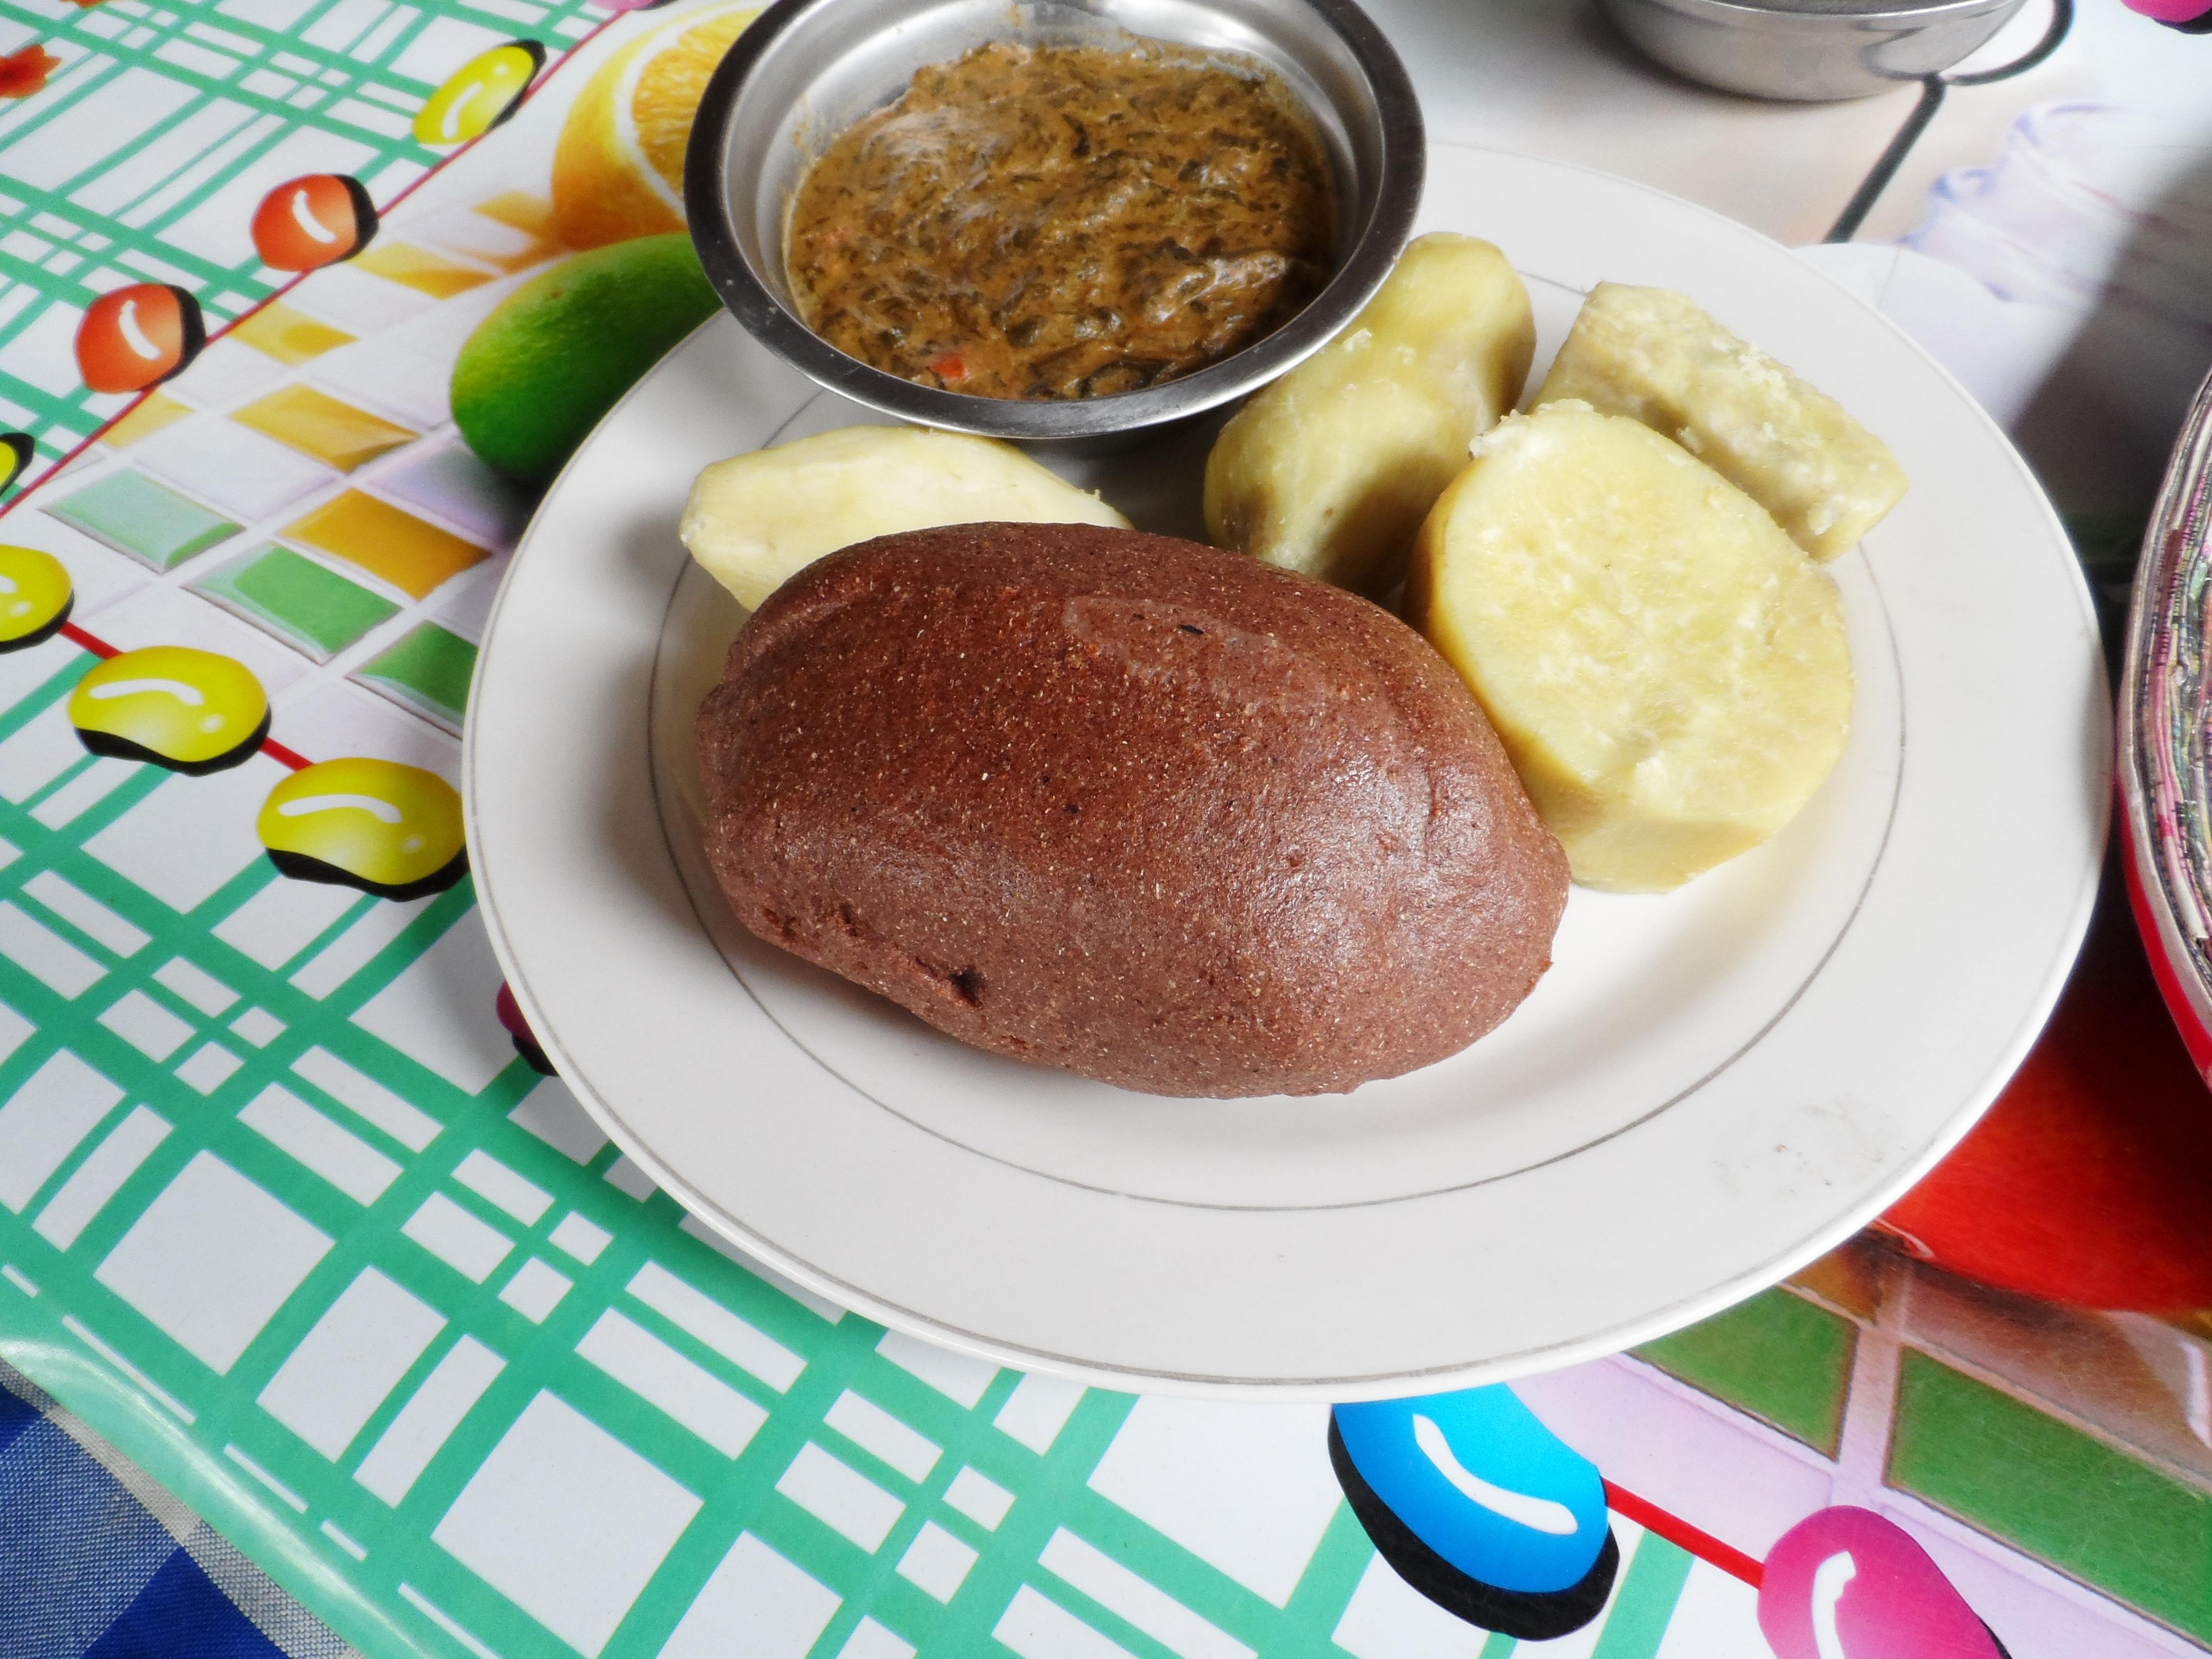 millet-bread-potatoes-and-malakwangbowl